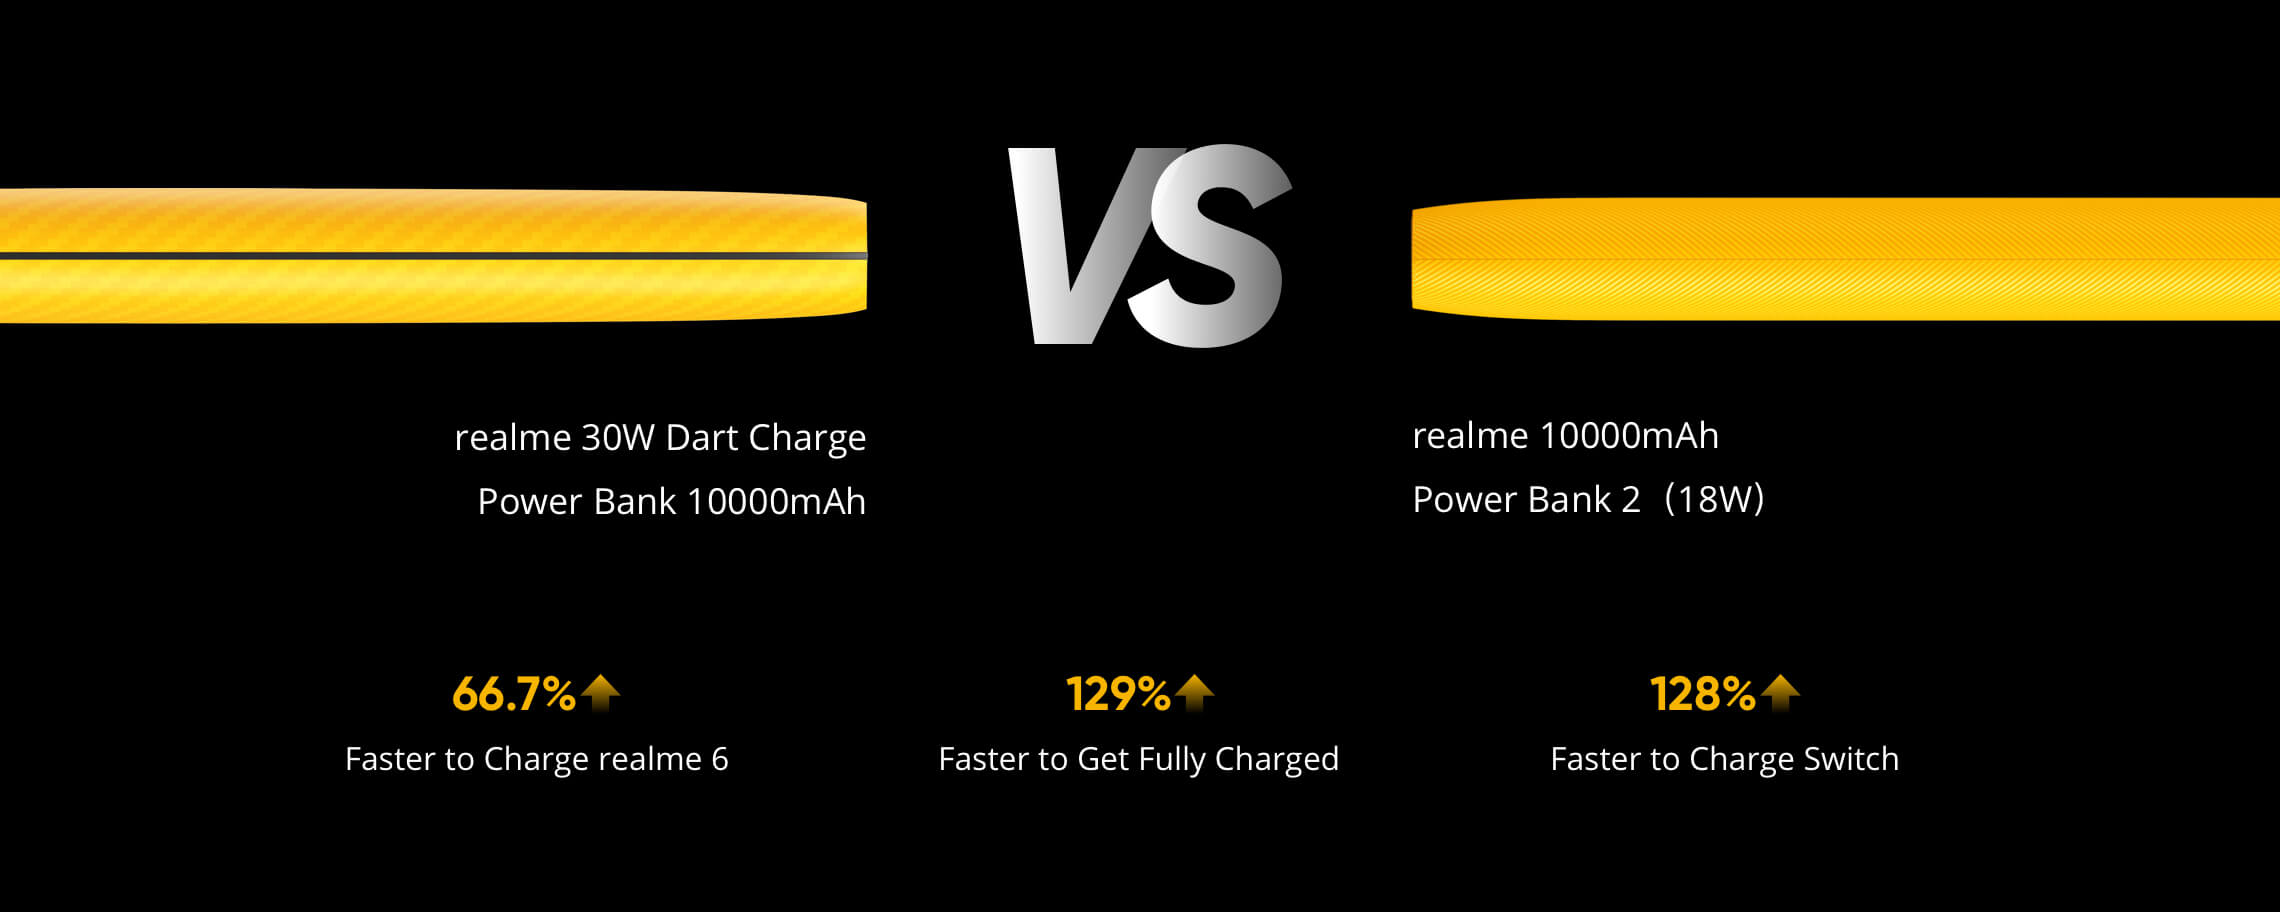 Realme Power Bank price